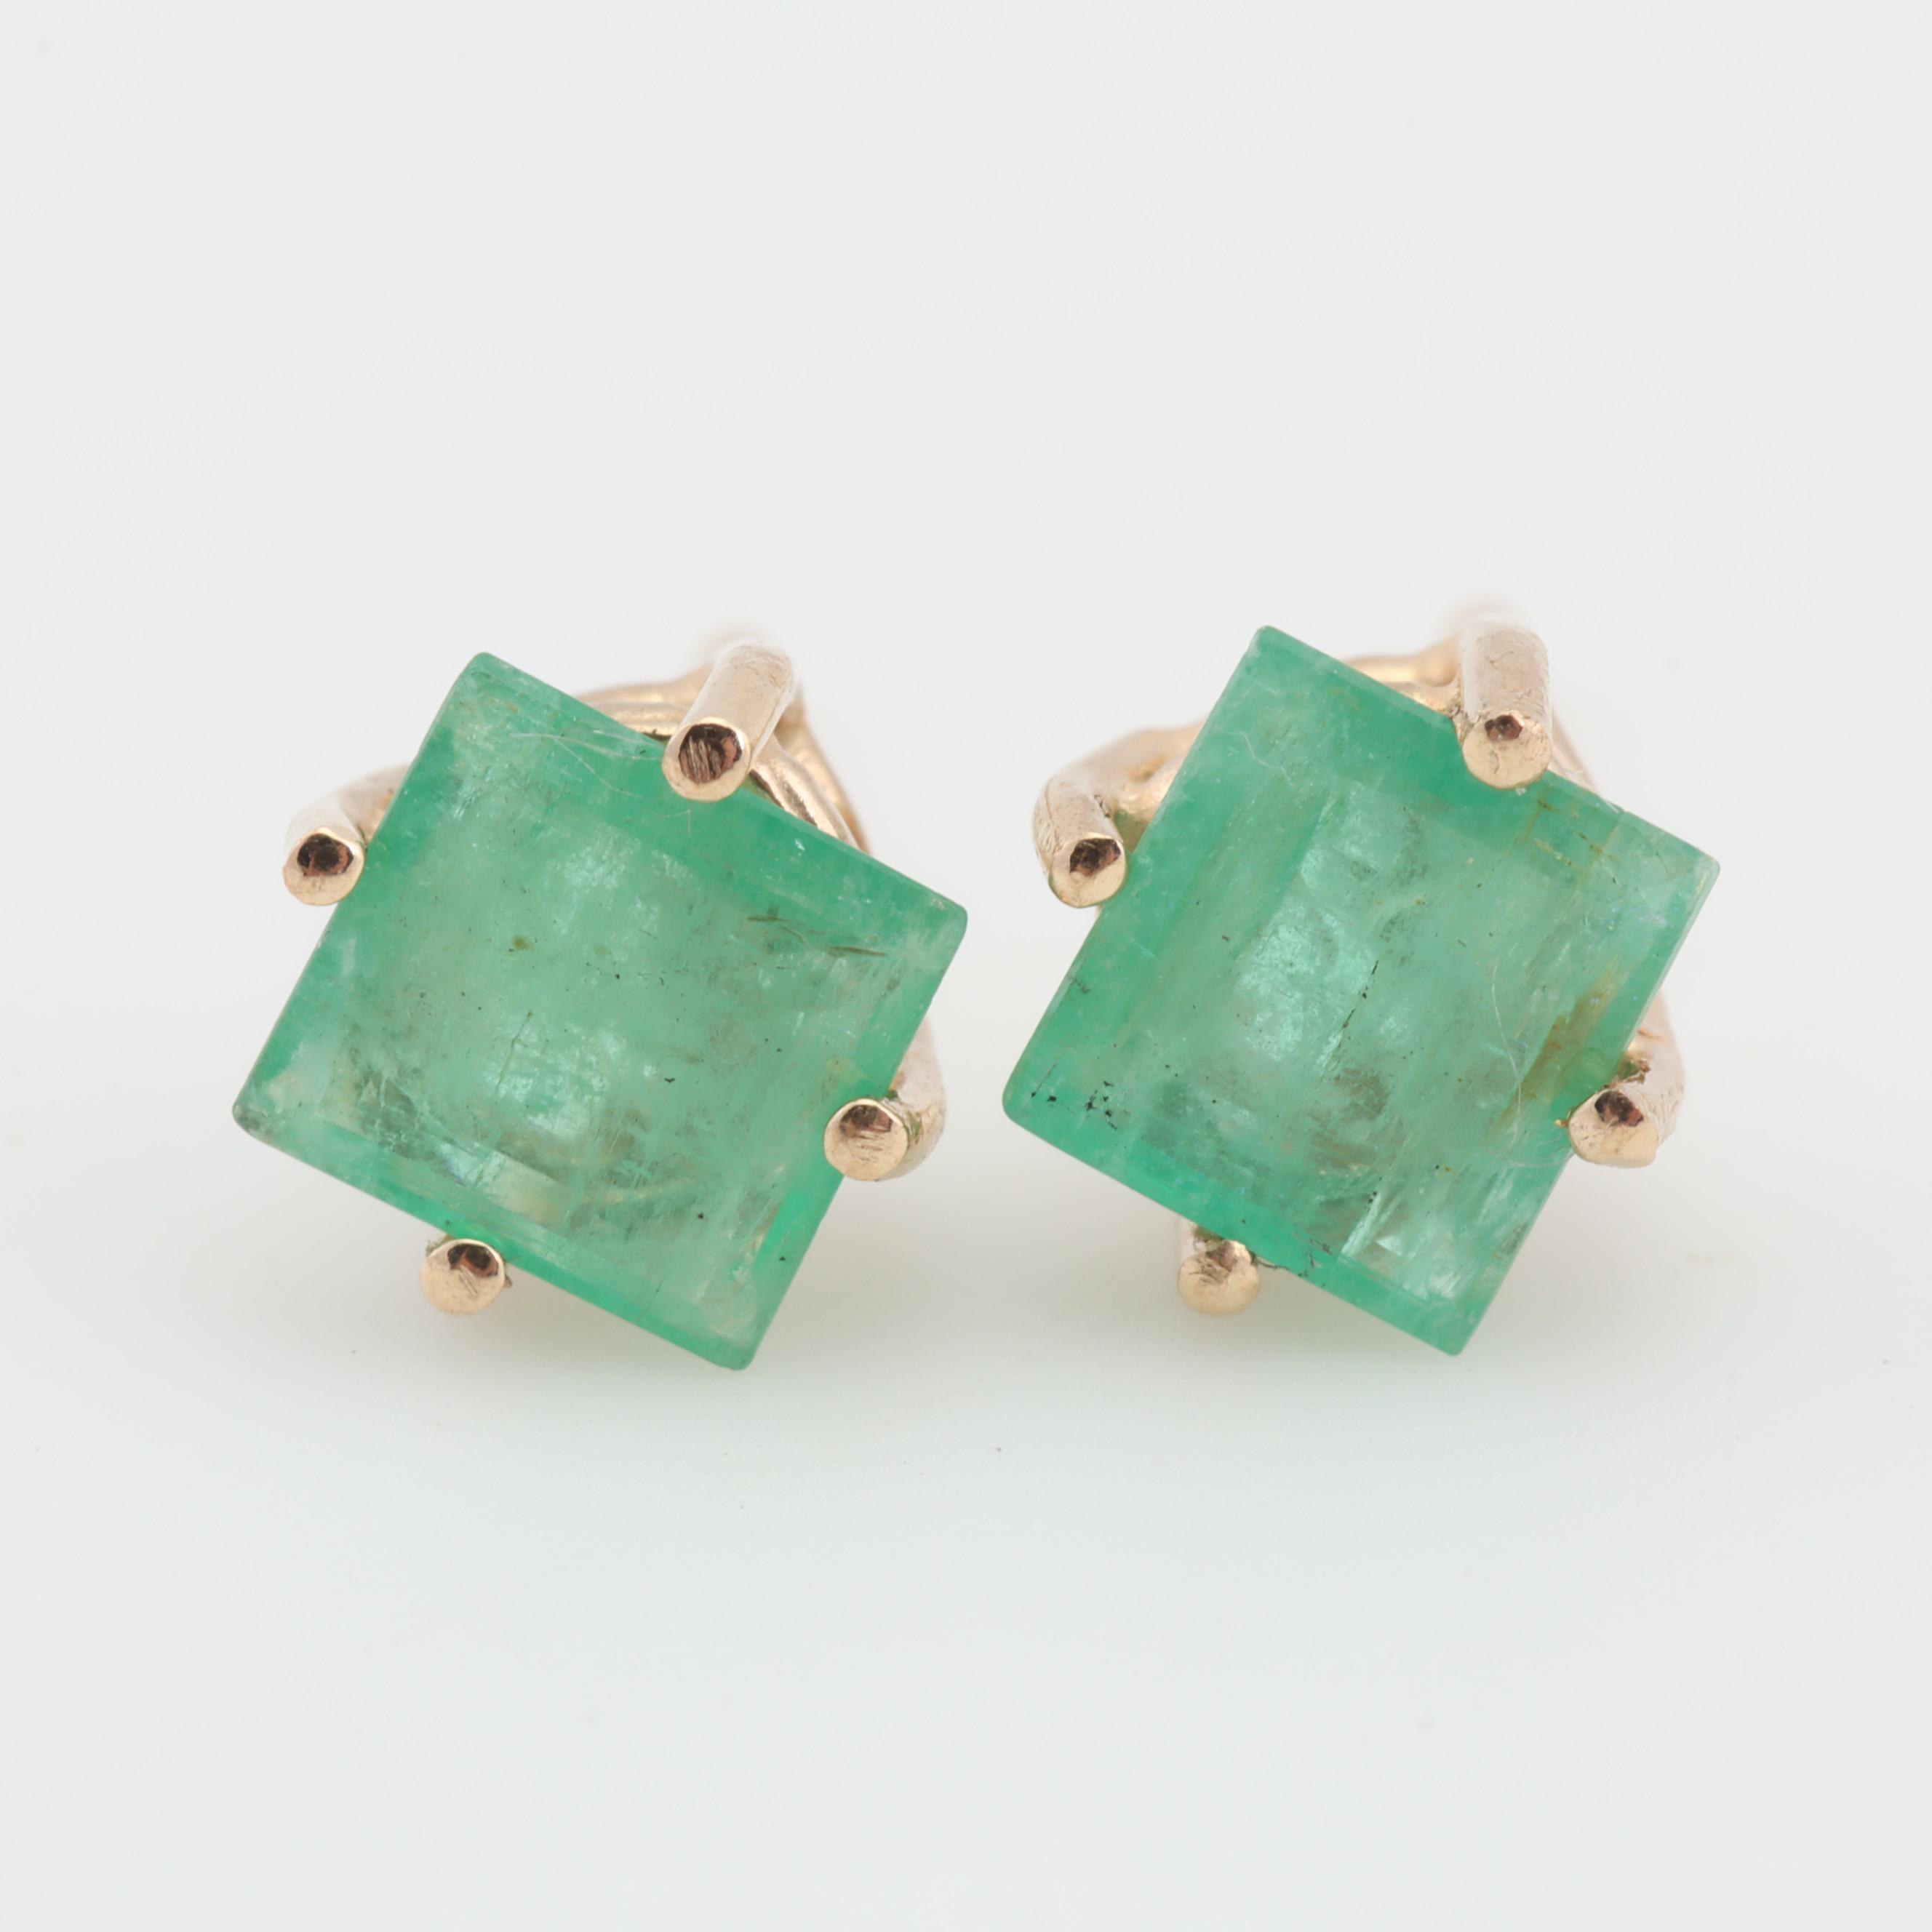 14K Yellow Gold Emerald Stud Earrings, 1.00 CTW